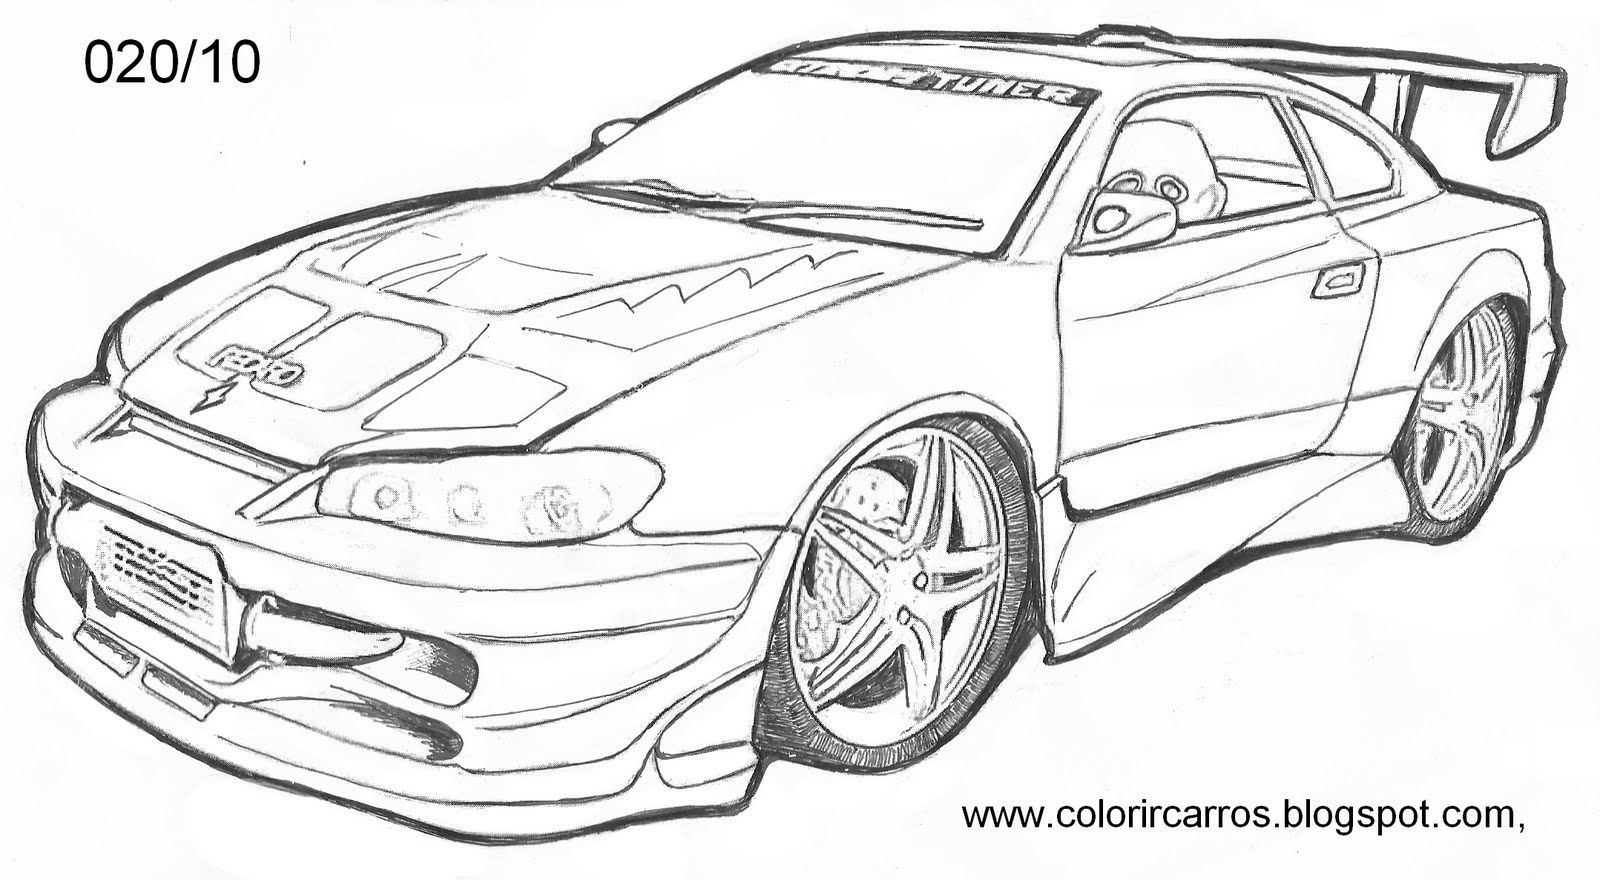 1969 Camaro Coloring Pages Coloring Coloring Pages